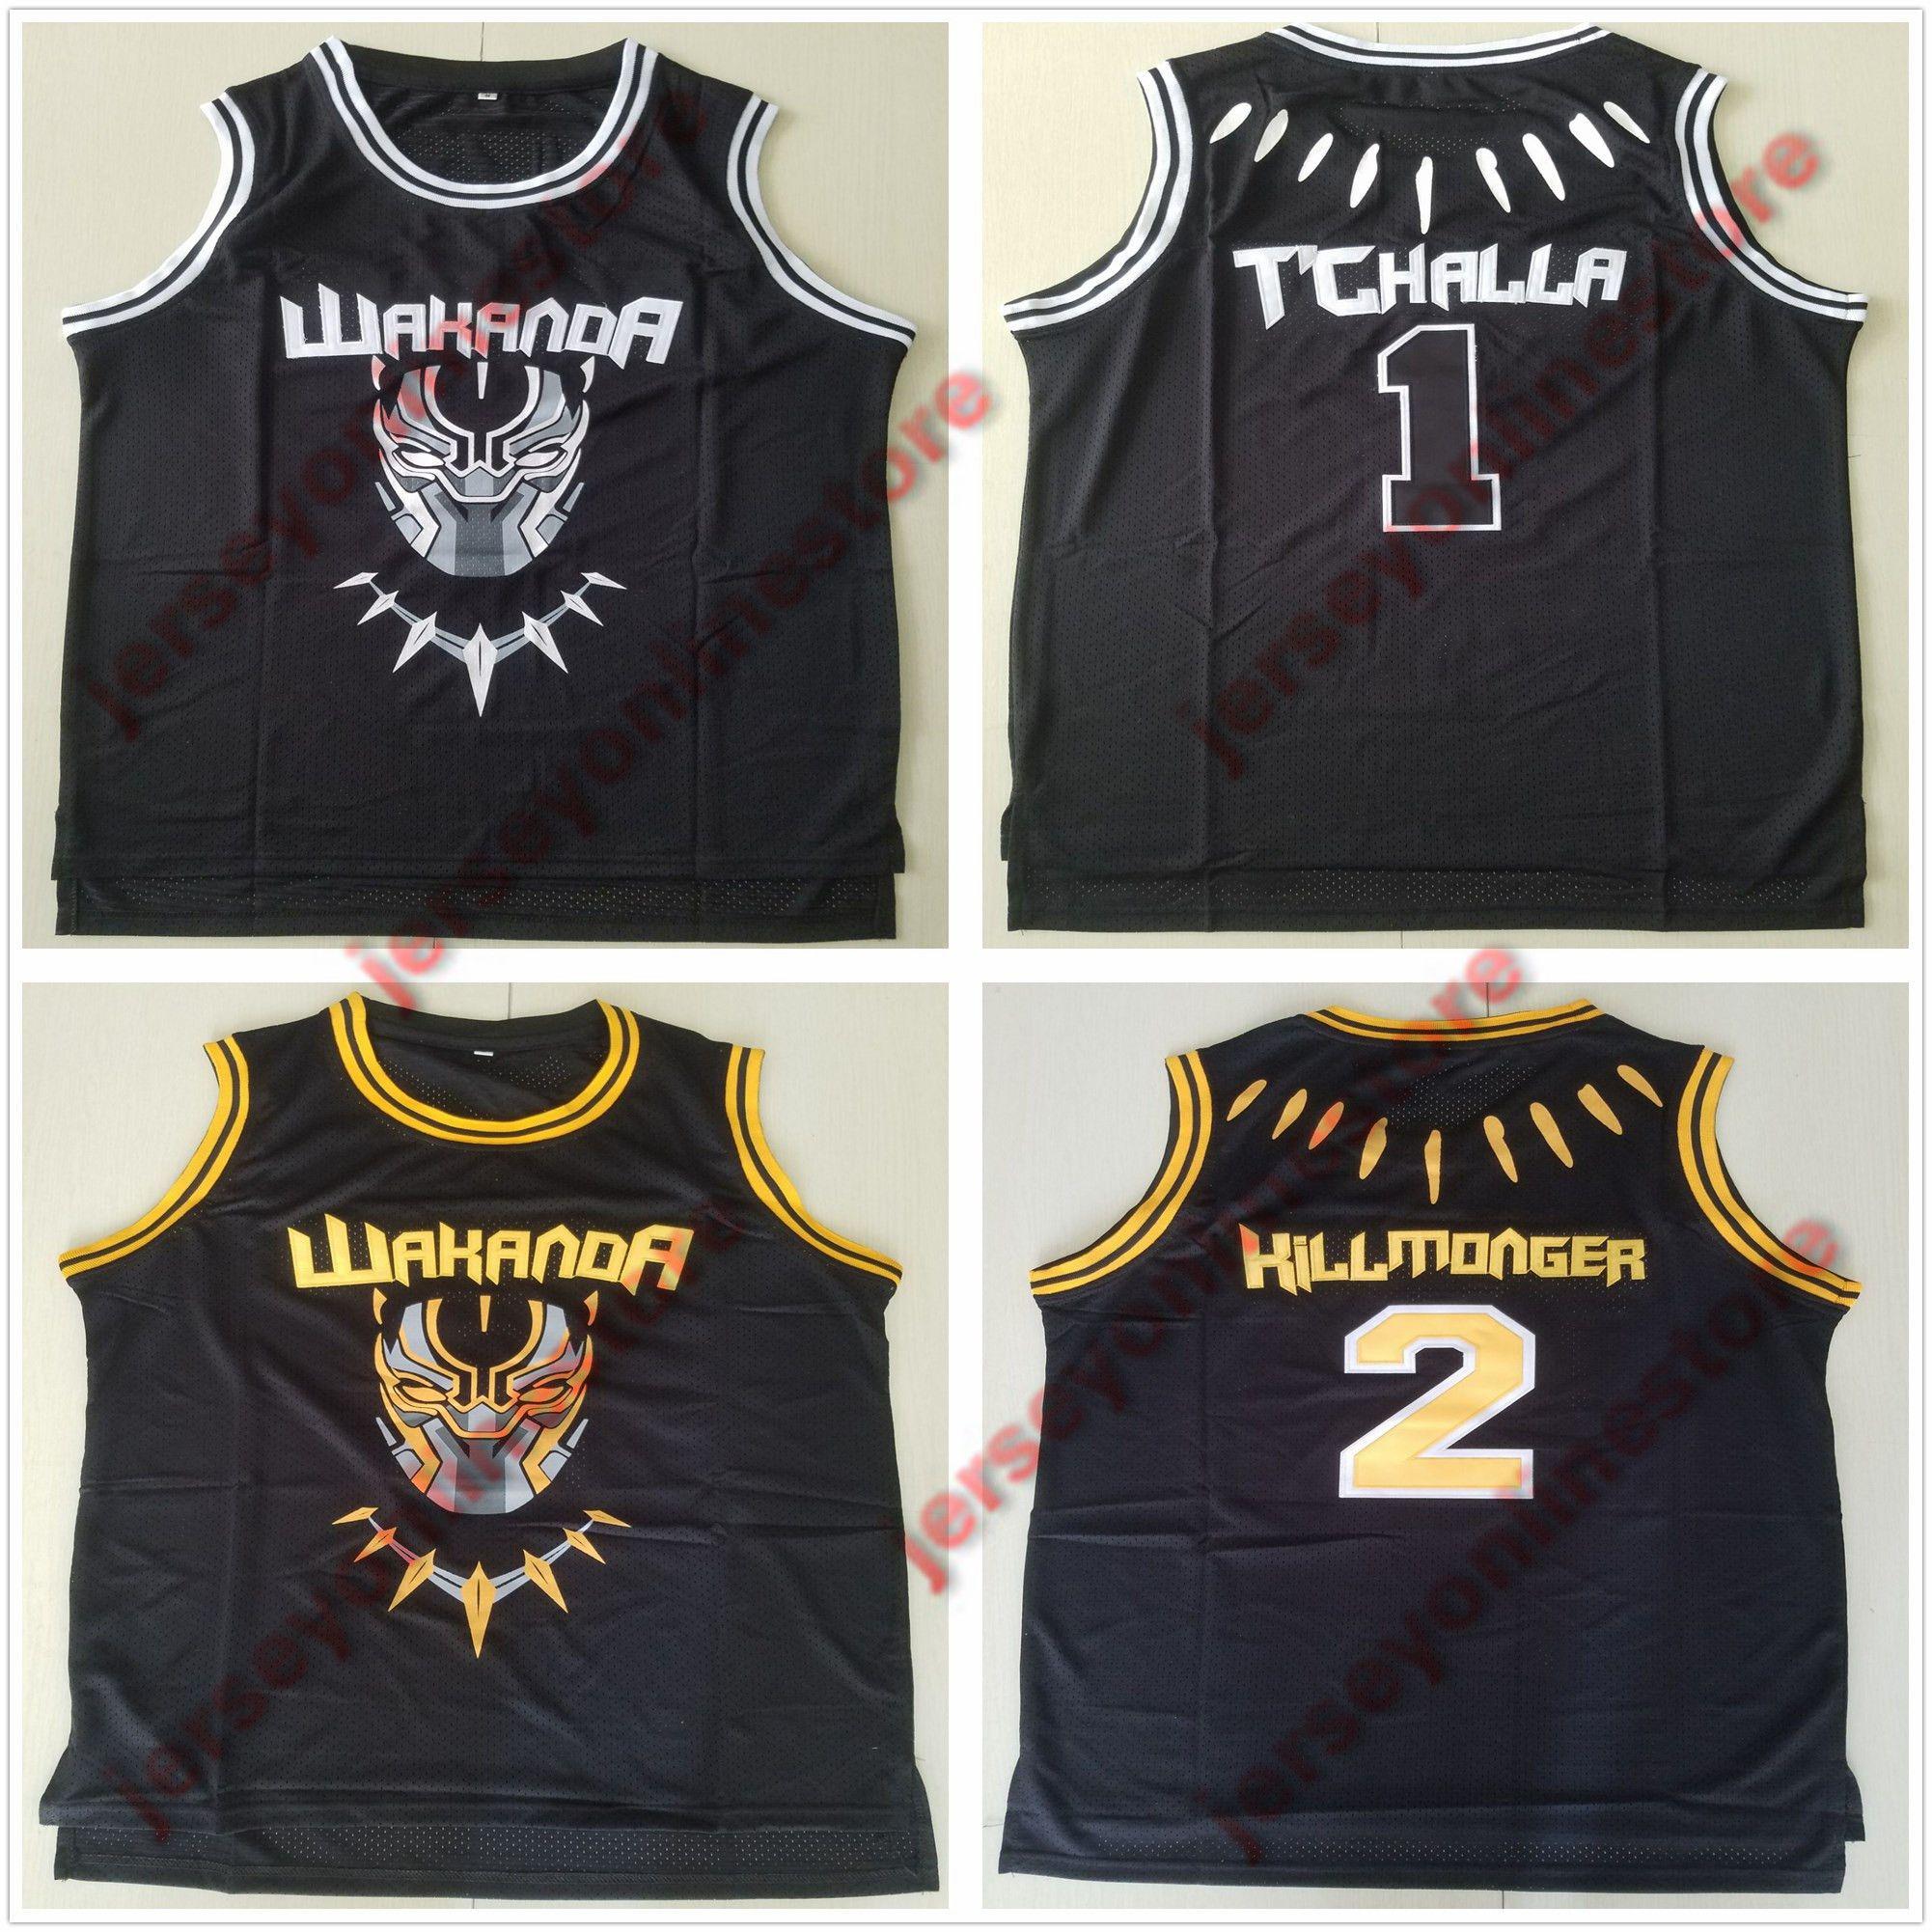 1cd1d4f1bd1 Mens The Black Panther Movie Wakanda T'Challa Jersey Black Stitched #2 Erik Killmonger  Basketball Jerseys Top Quality